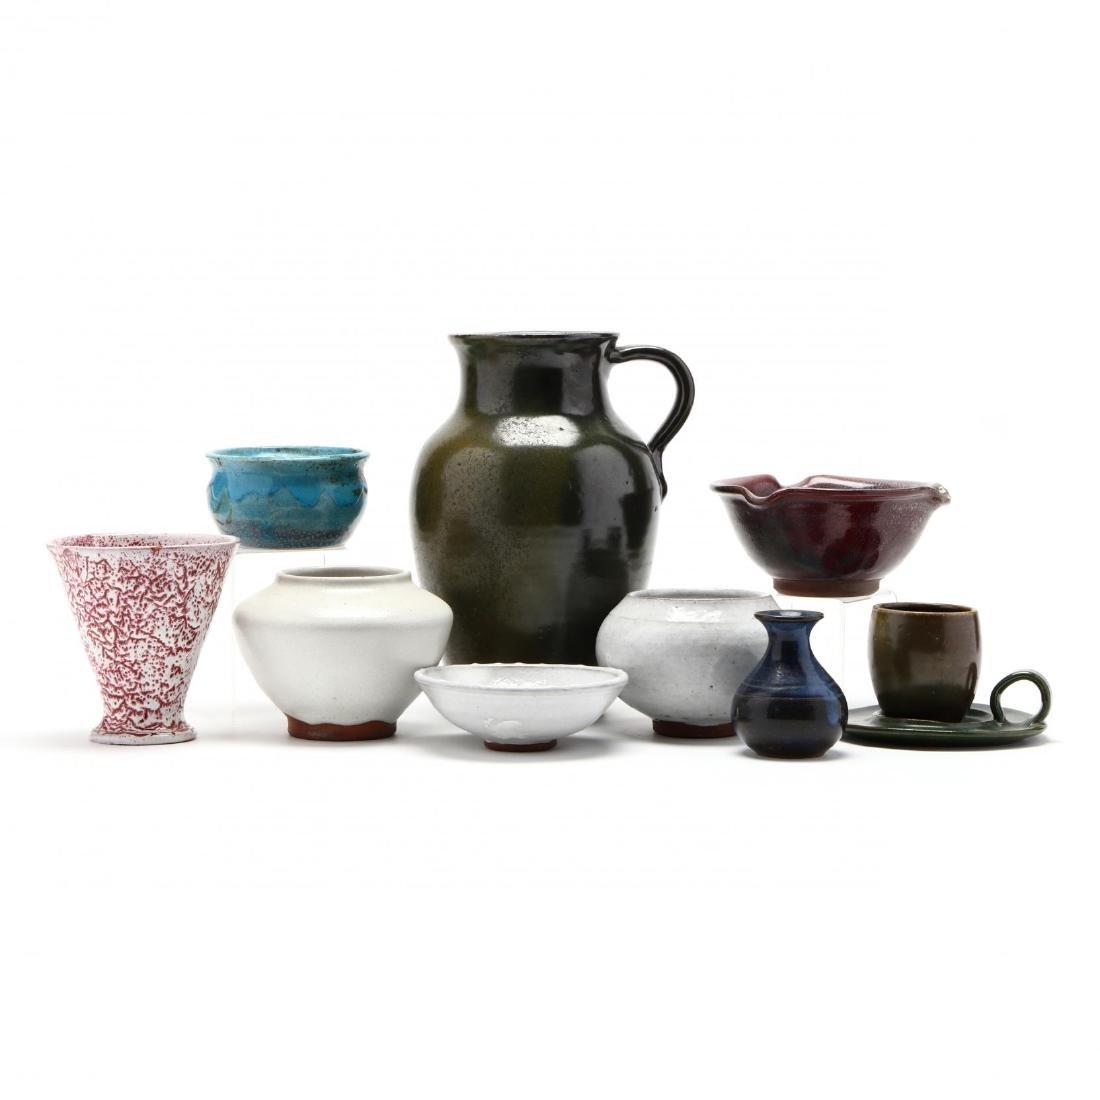 A Group of North Carolina Pottery